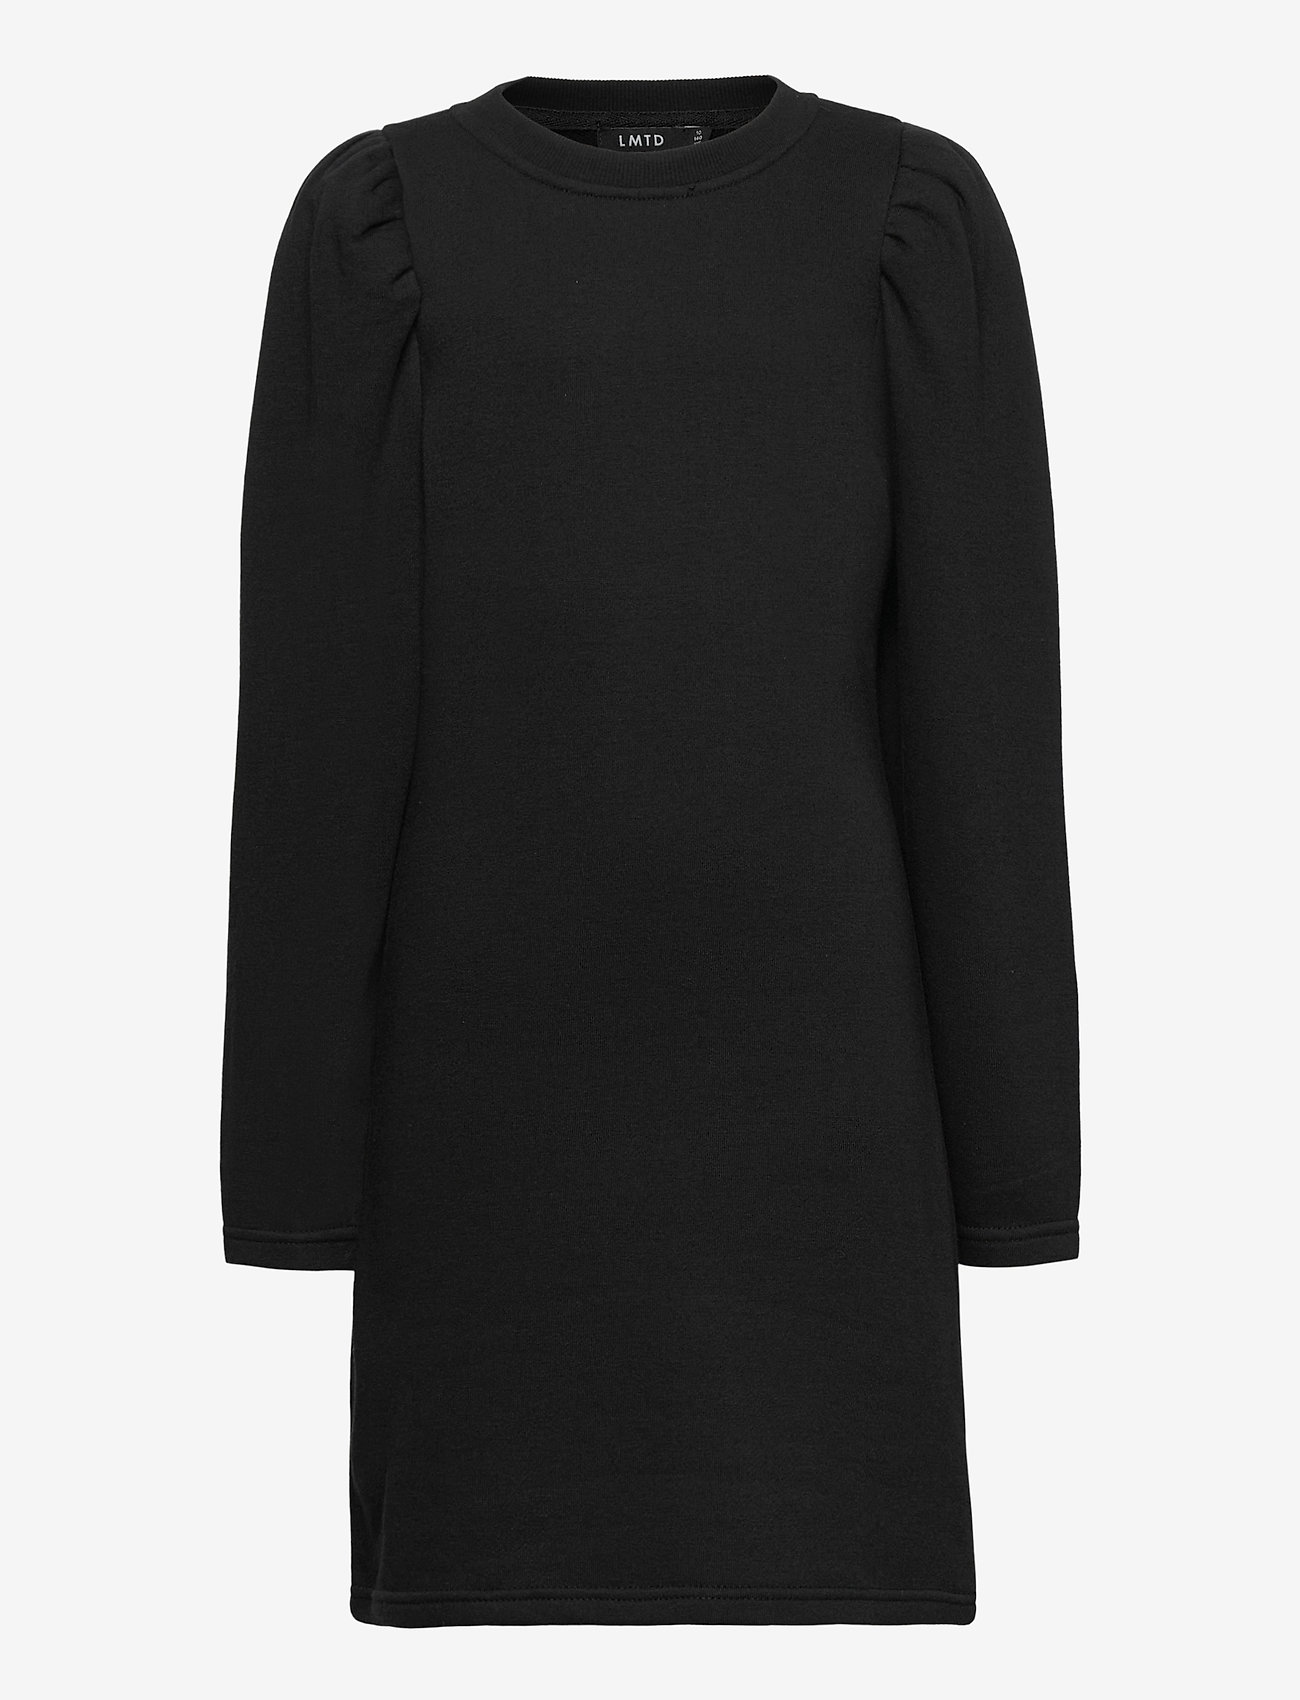 LMTD - NLFTINKER LS SWEAT DRESS - kleider - black - 0